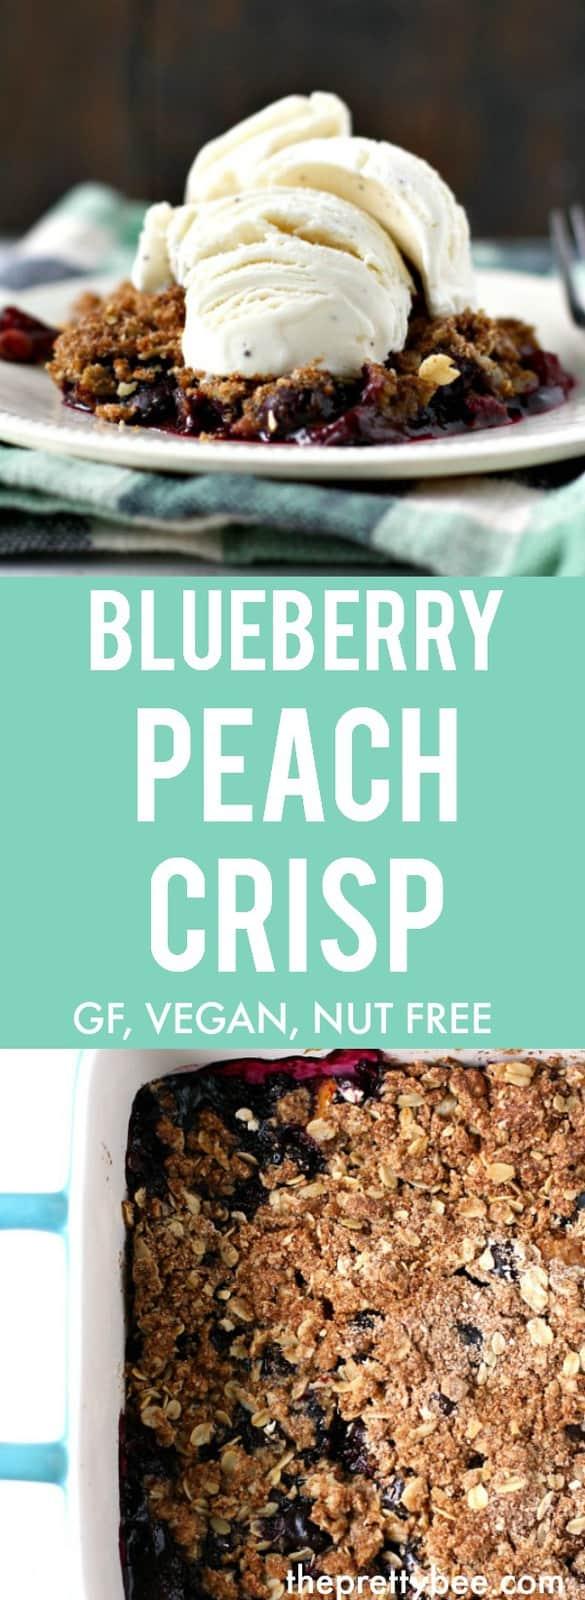 Easy and delicious #glutenfree #vegan blueberry peach crisp is the perfect summer dessert! #nutfree #dairyfree #blueberry